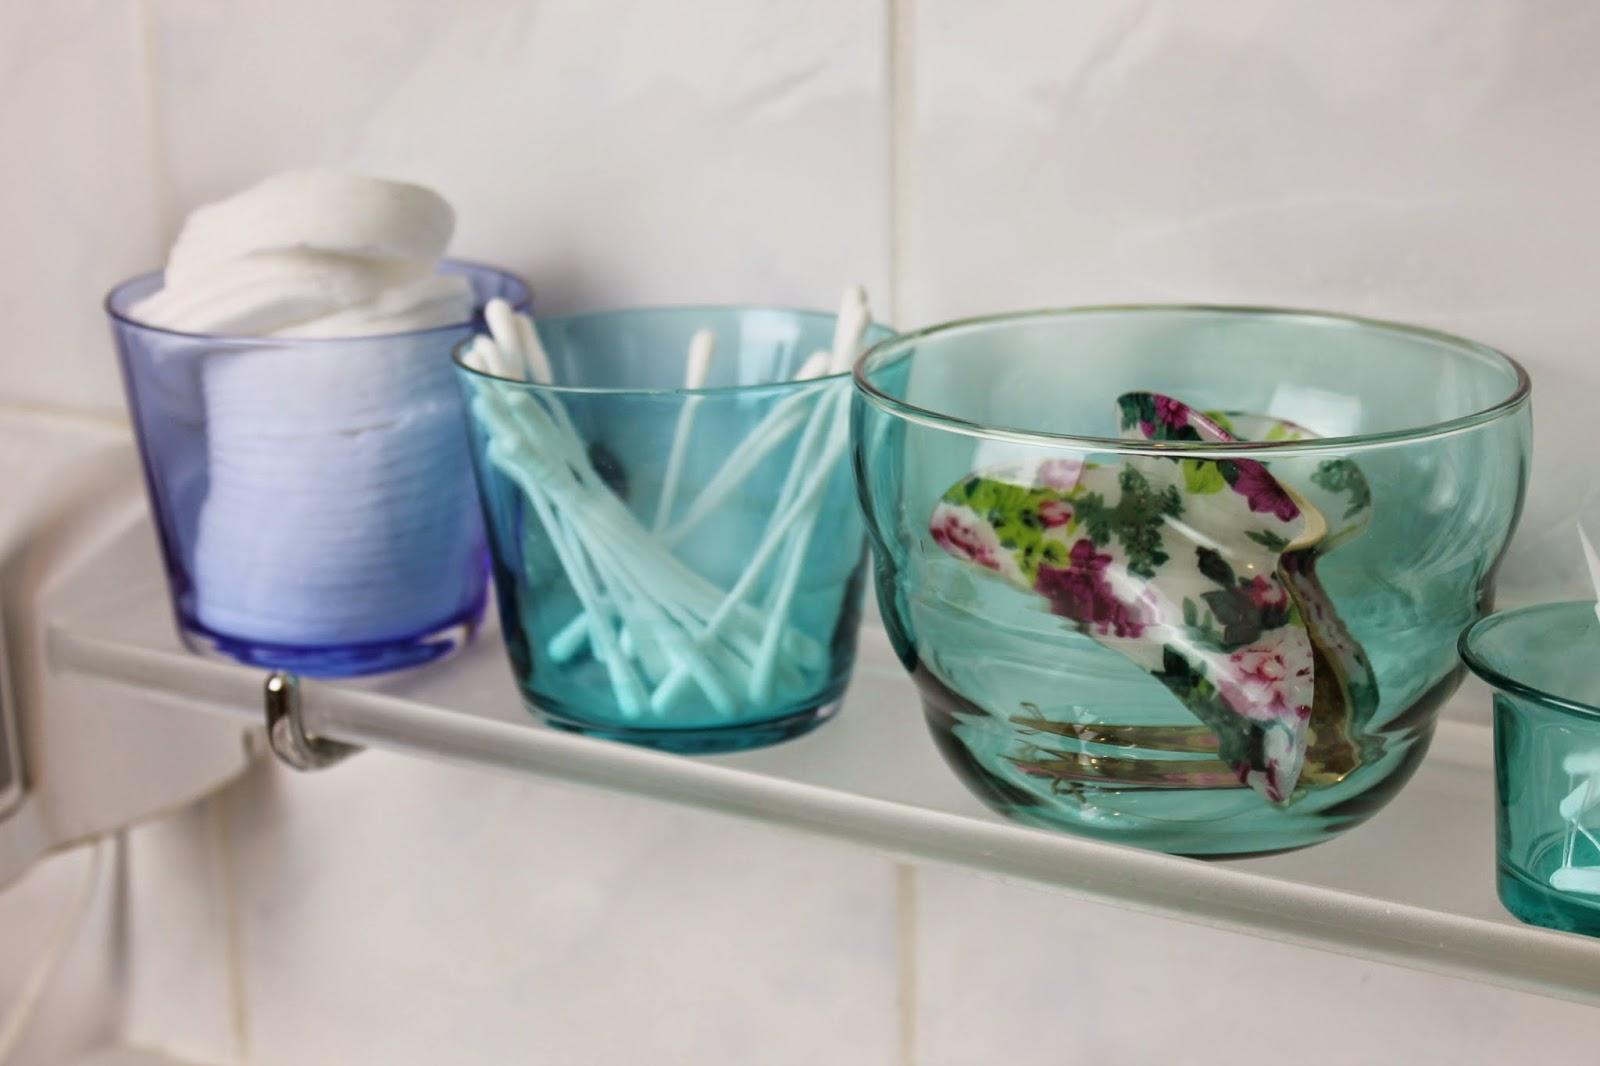 Badezimmerdeko Gläser